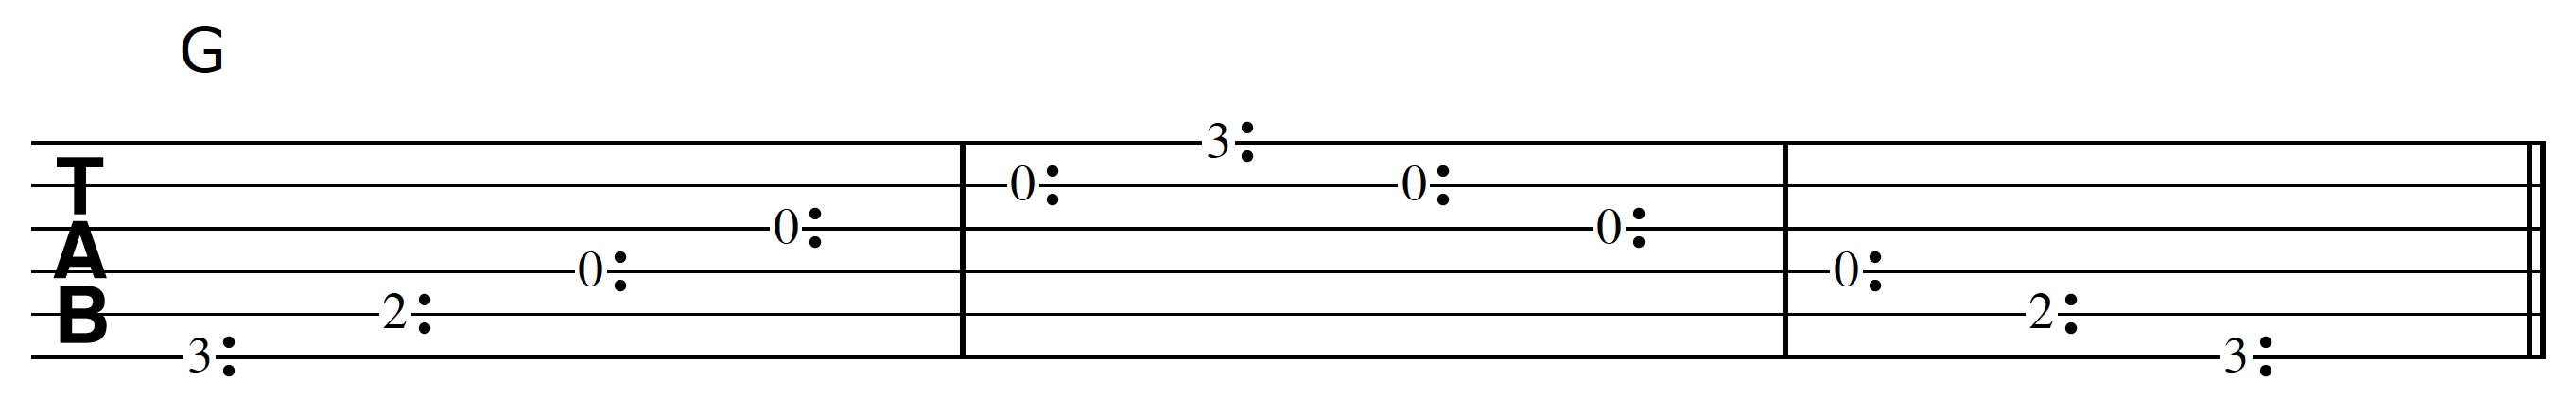 Harp Harmonic Tracking G Chord